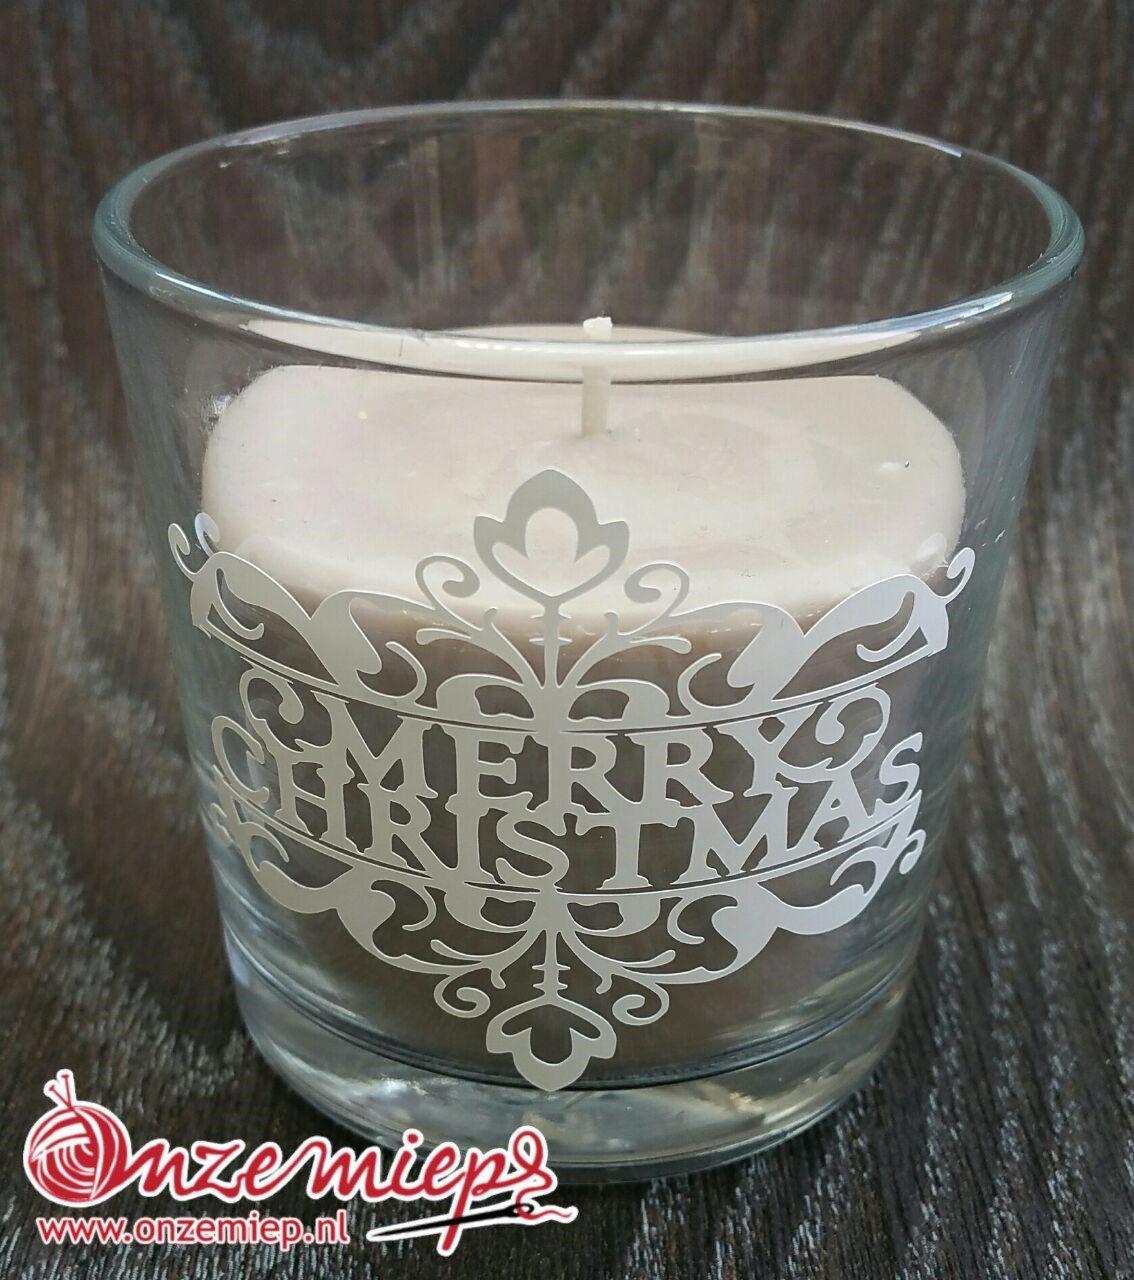 "Bruine geurkaars met de tekst ""Merry Christmas"""